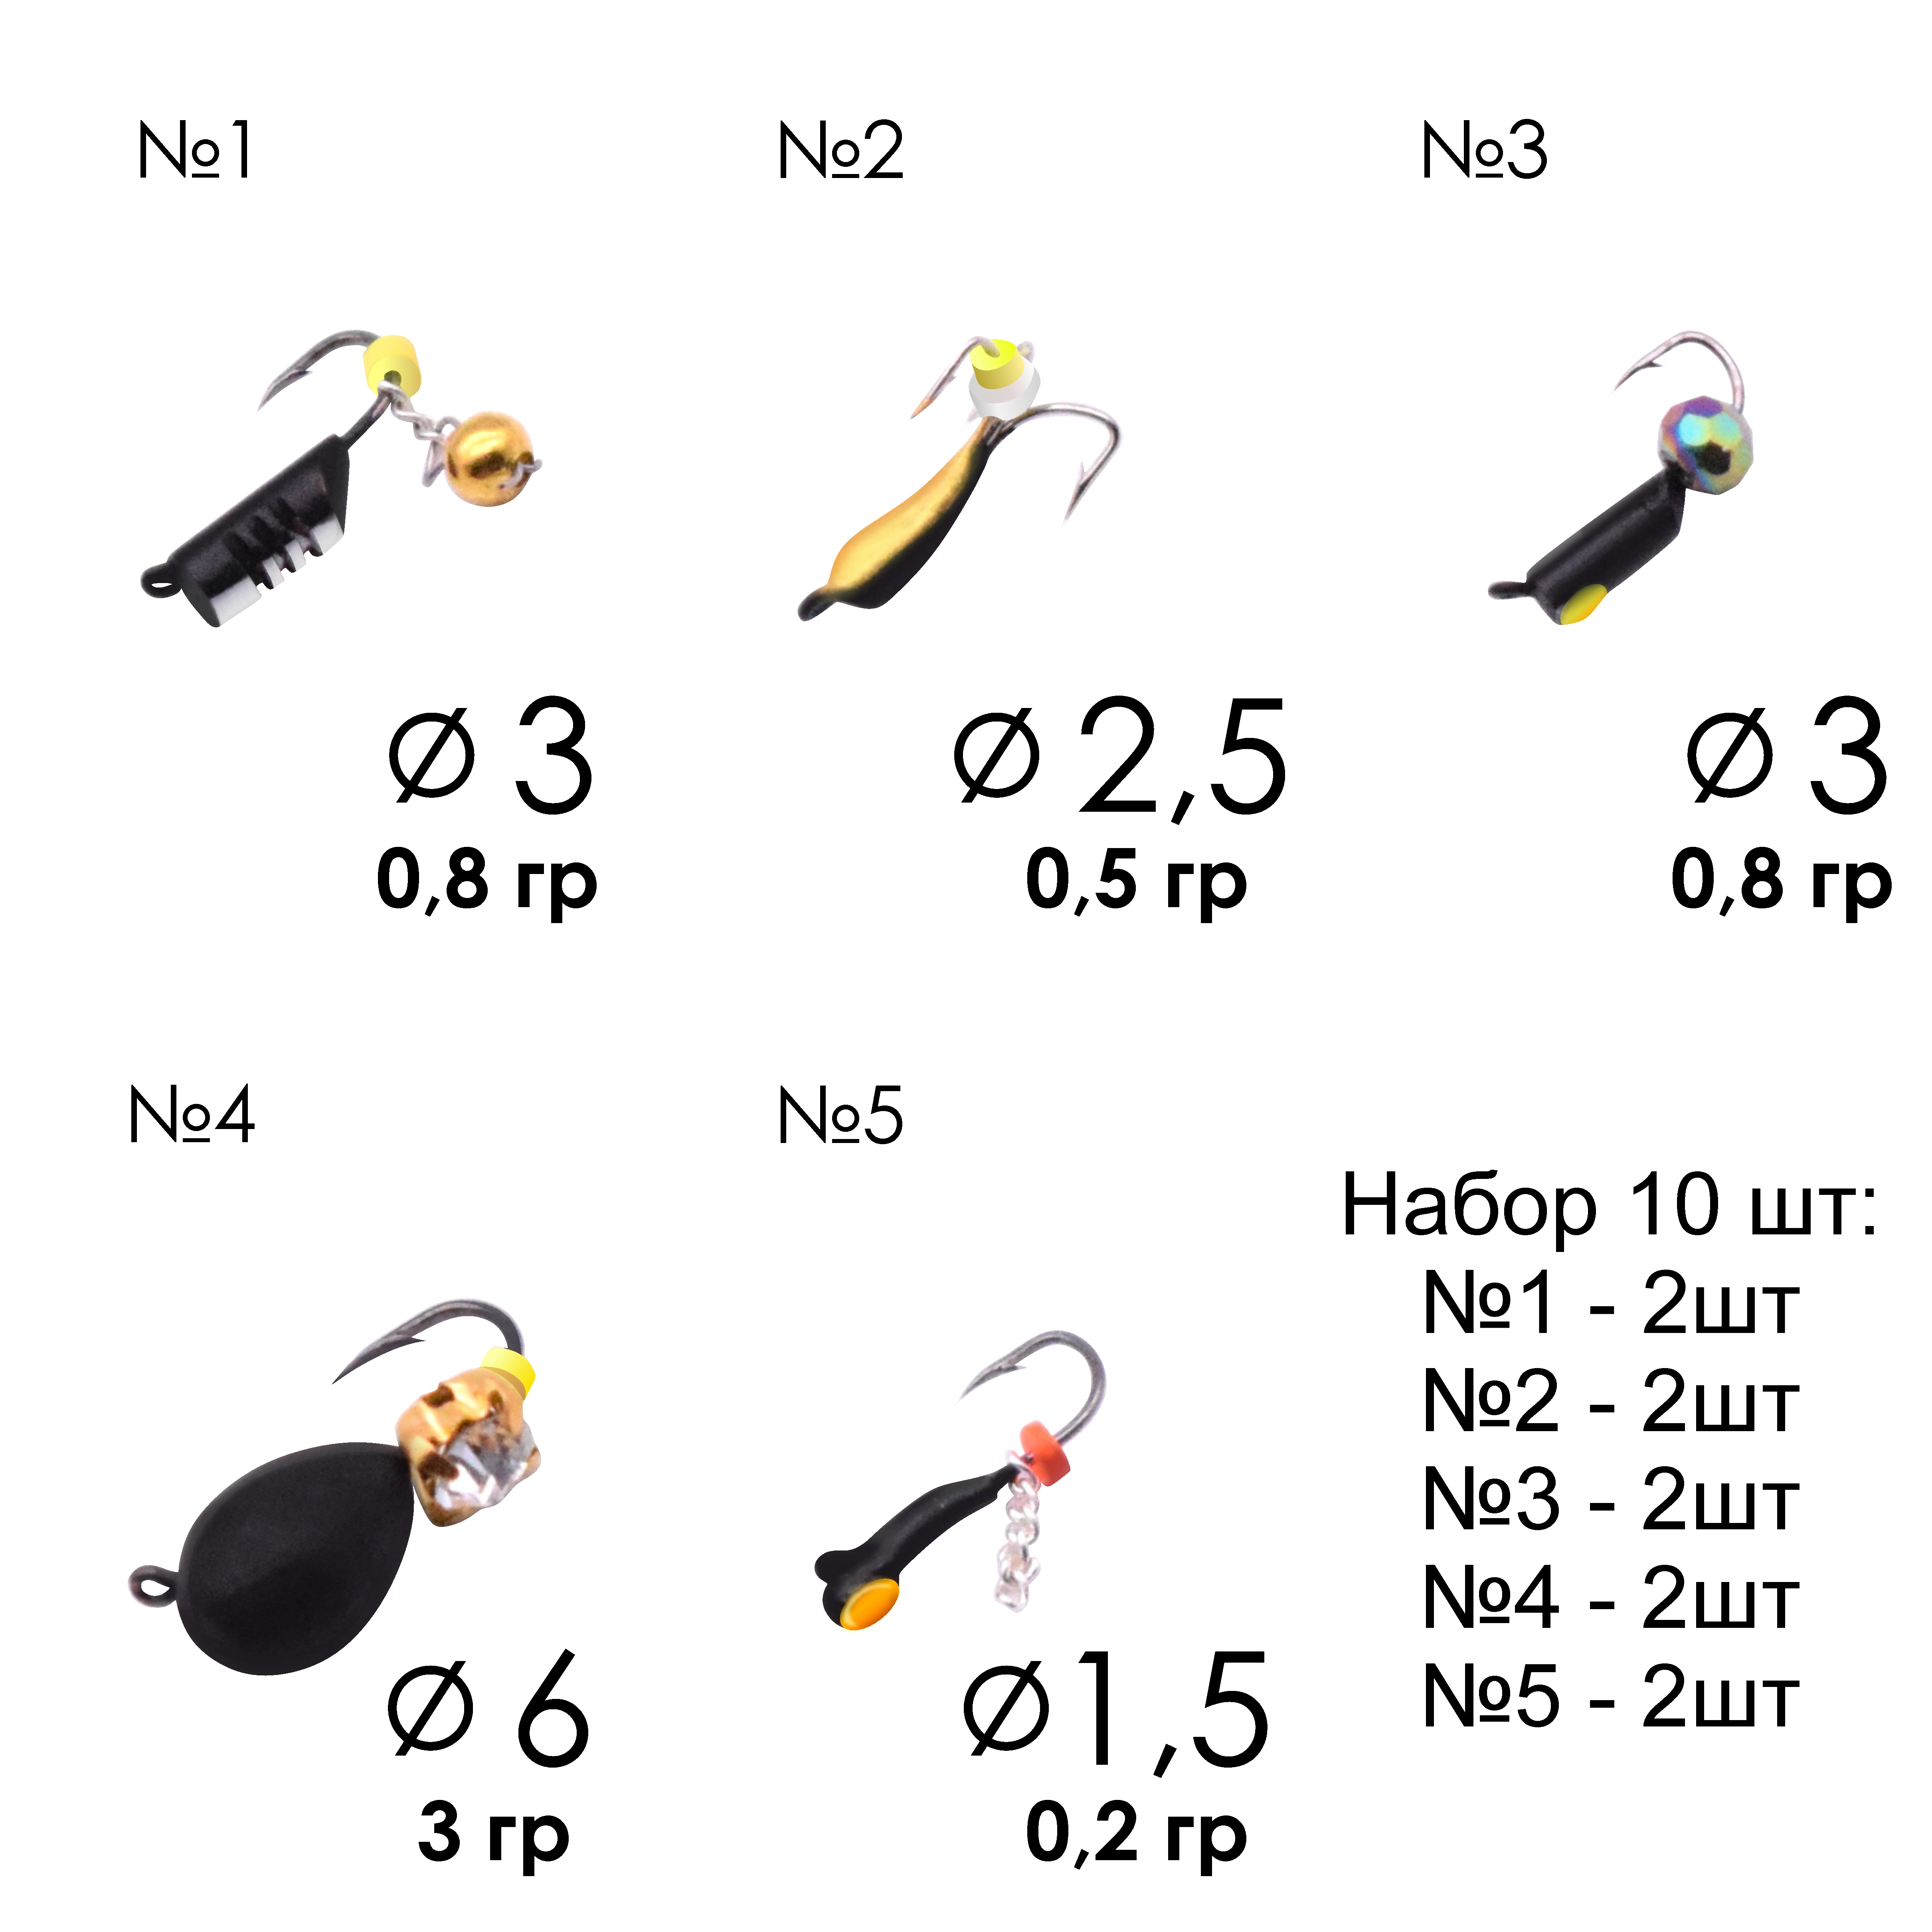 Jig For Winter Fishing Tungsten гваздекуб гваздешарик чертик Lure Fishing Accessories Set For Fishing 10 PCs